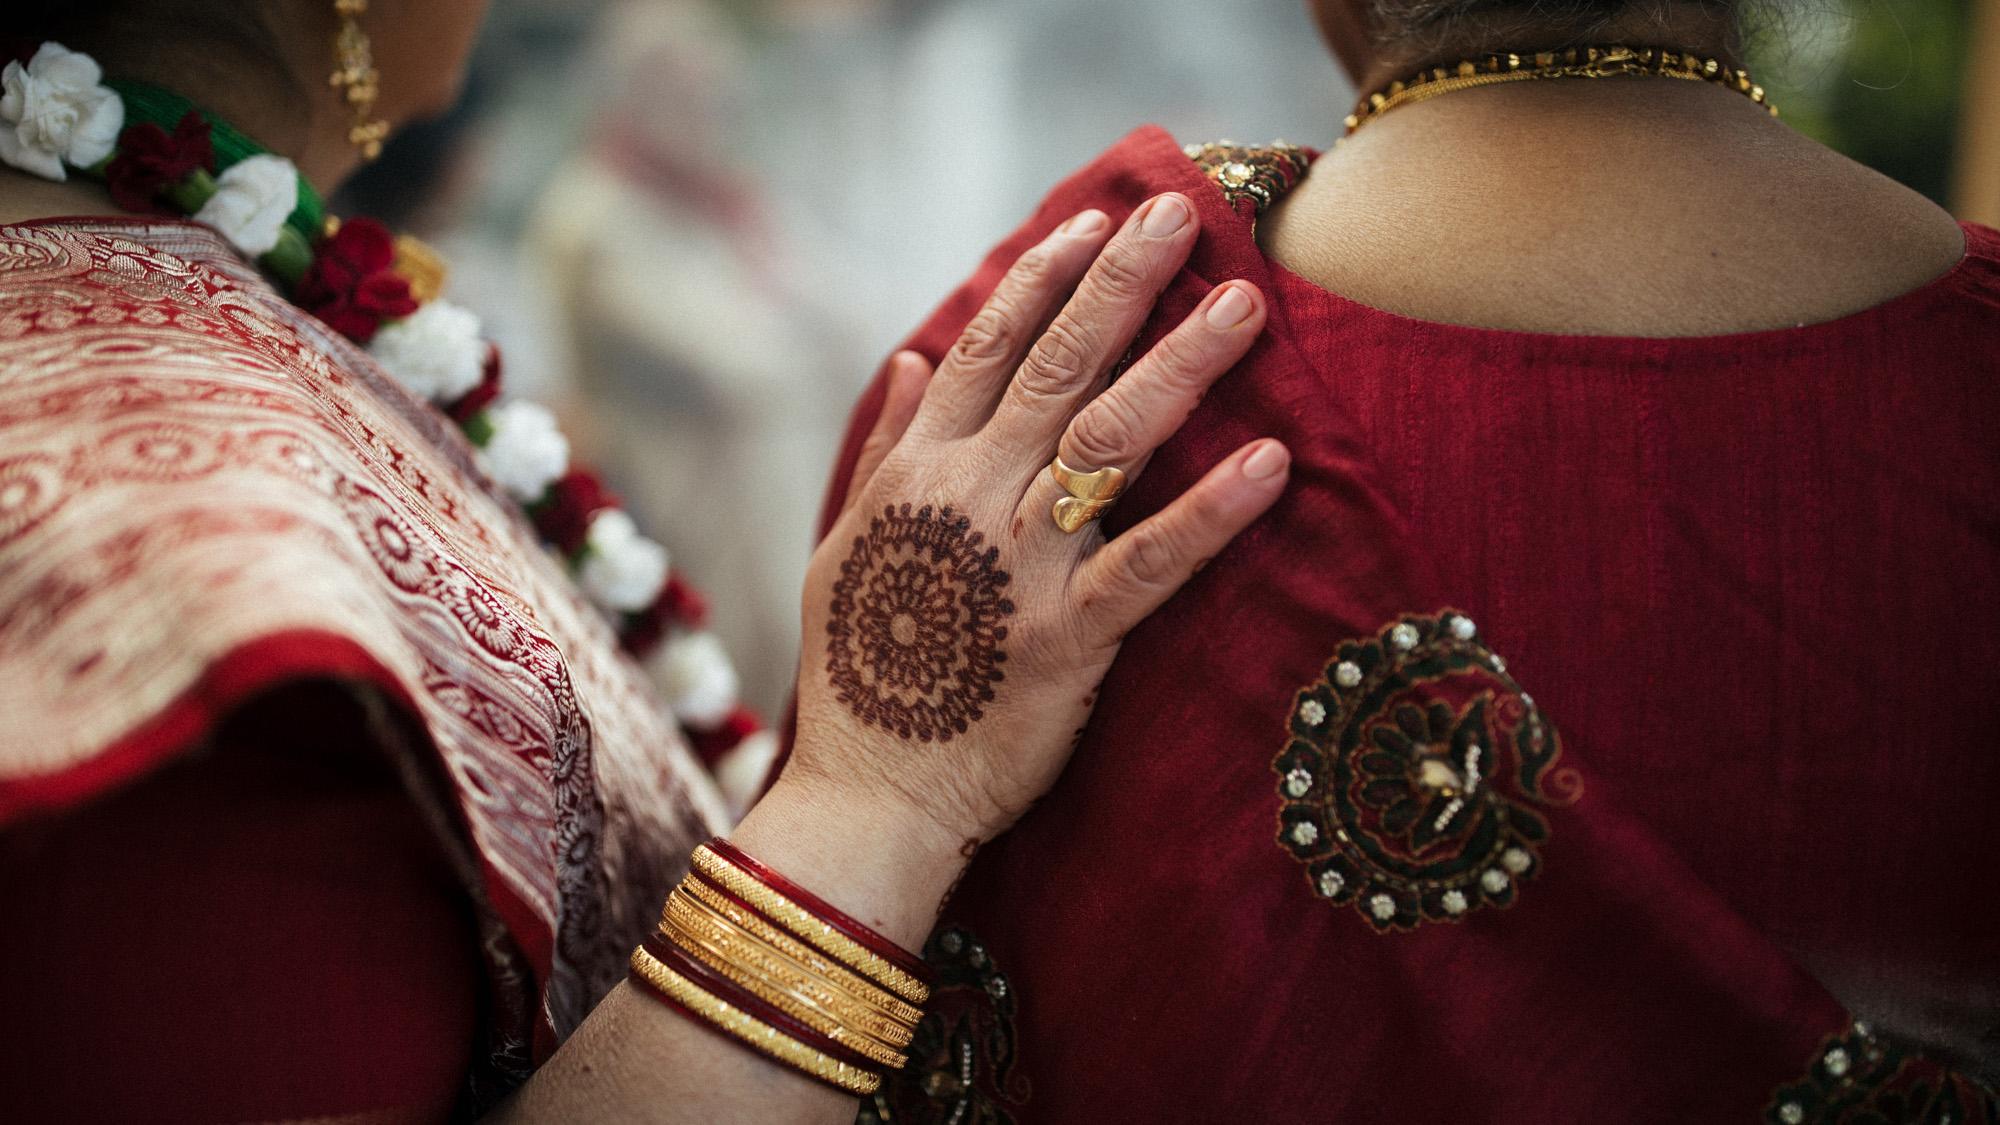 anu_maneesh_alec_vanderboom_Indian_wedding_photography-0111.jpg